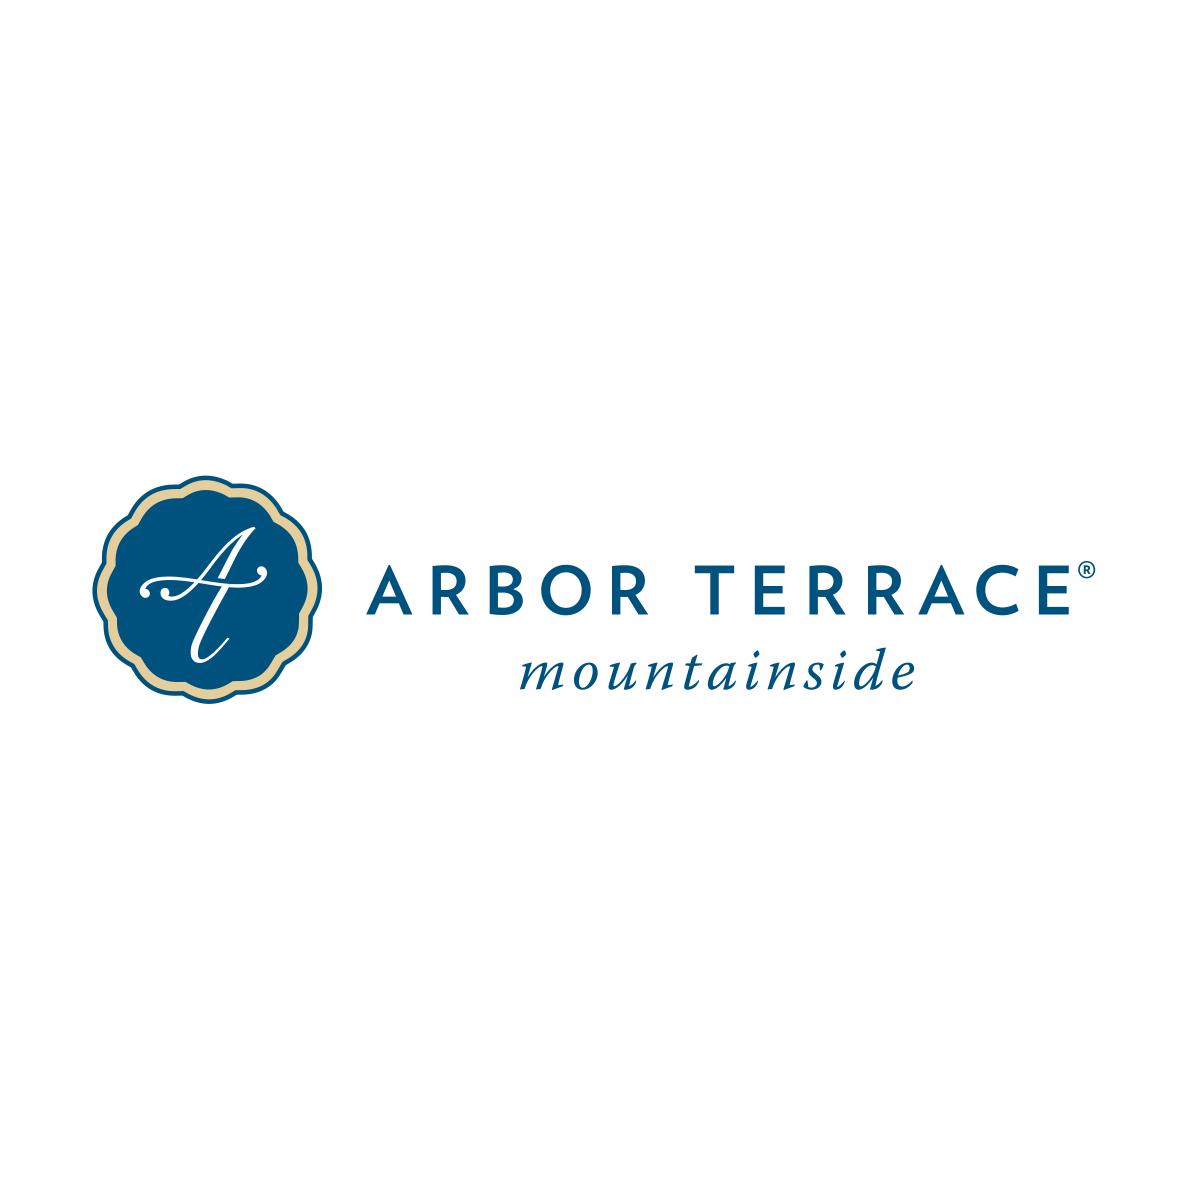 Arbor Terrace Mountainside